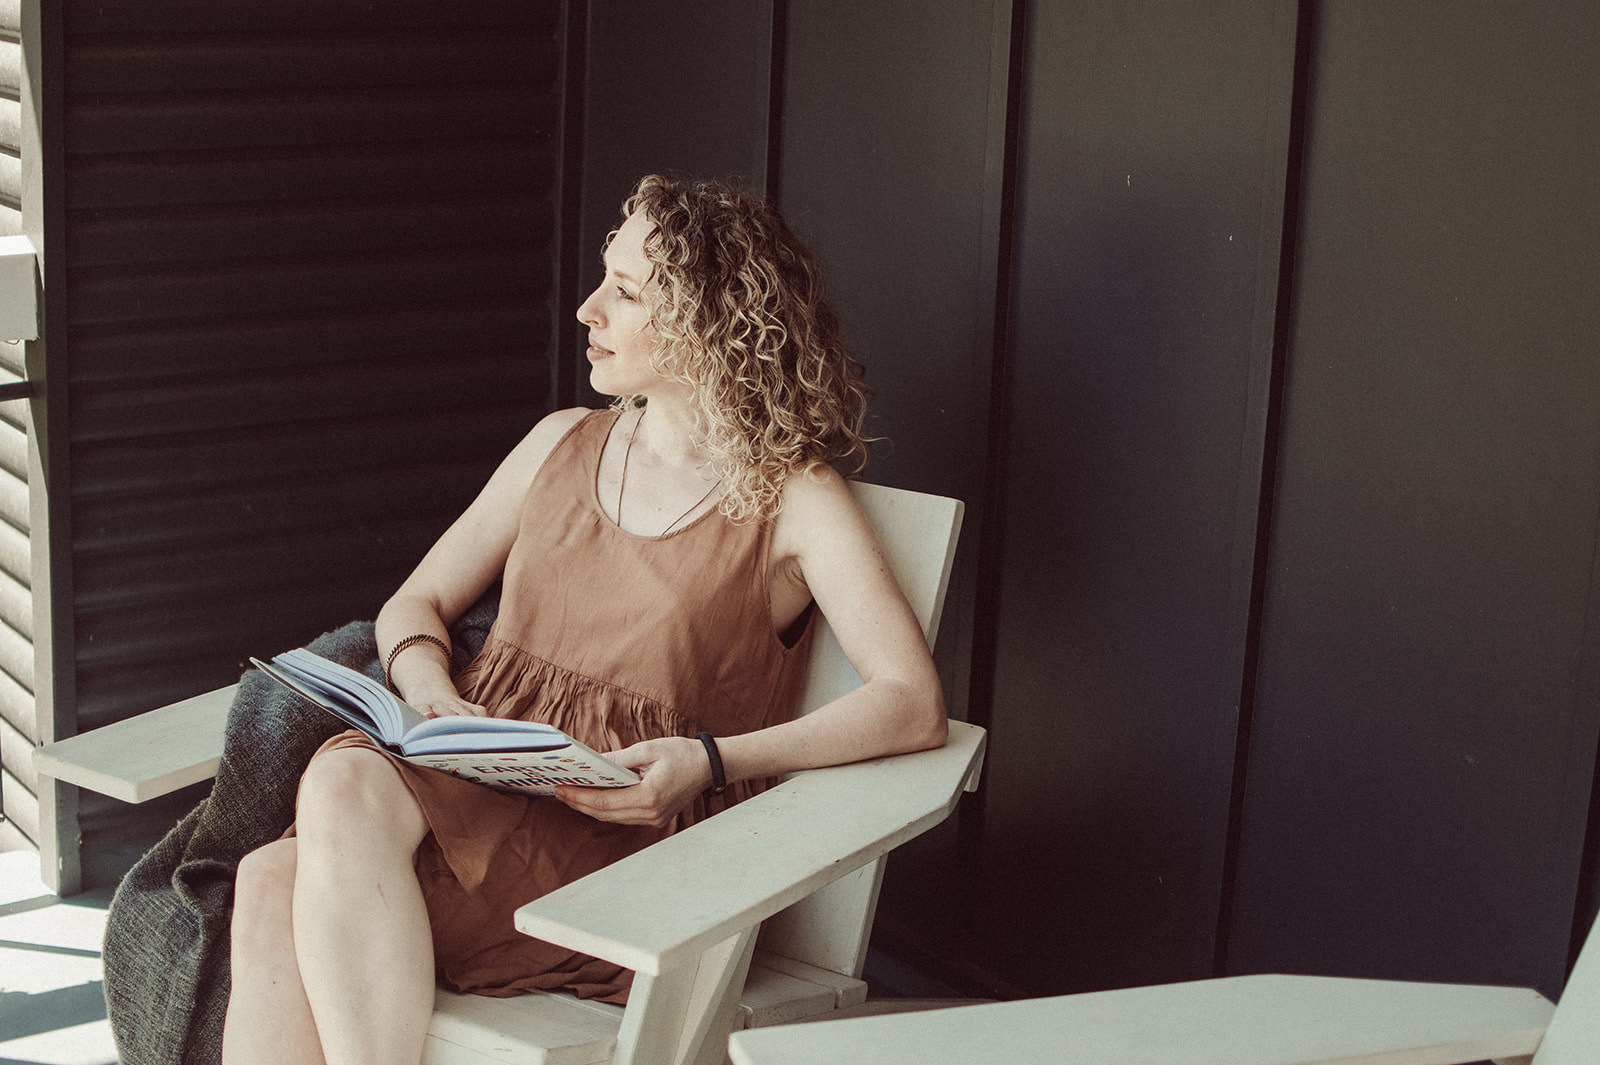 Partnership with Aimee Devlin | Aimee Devlin